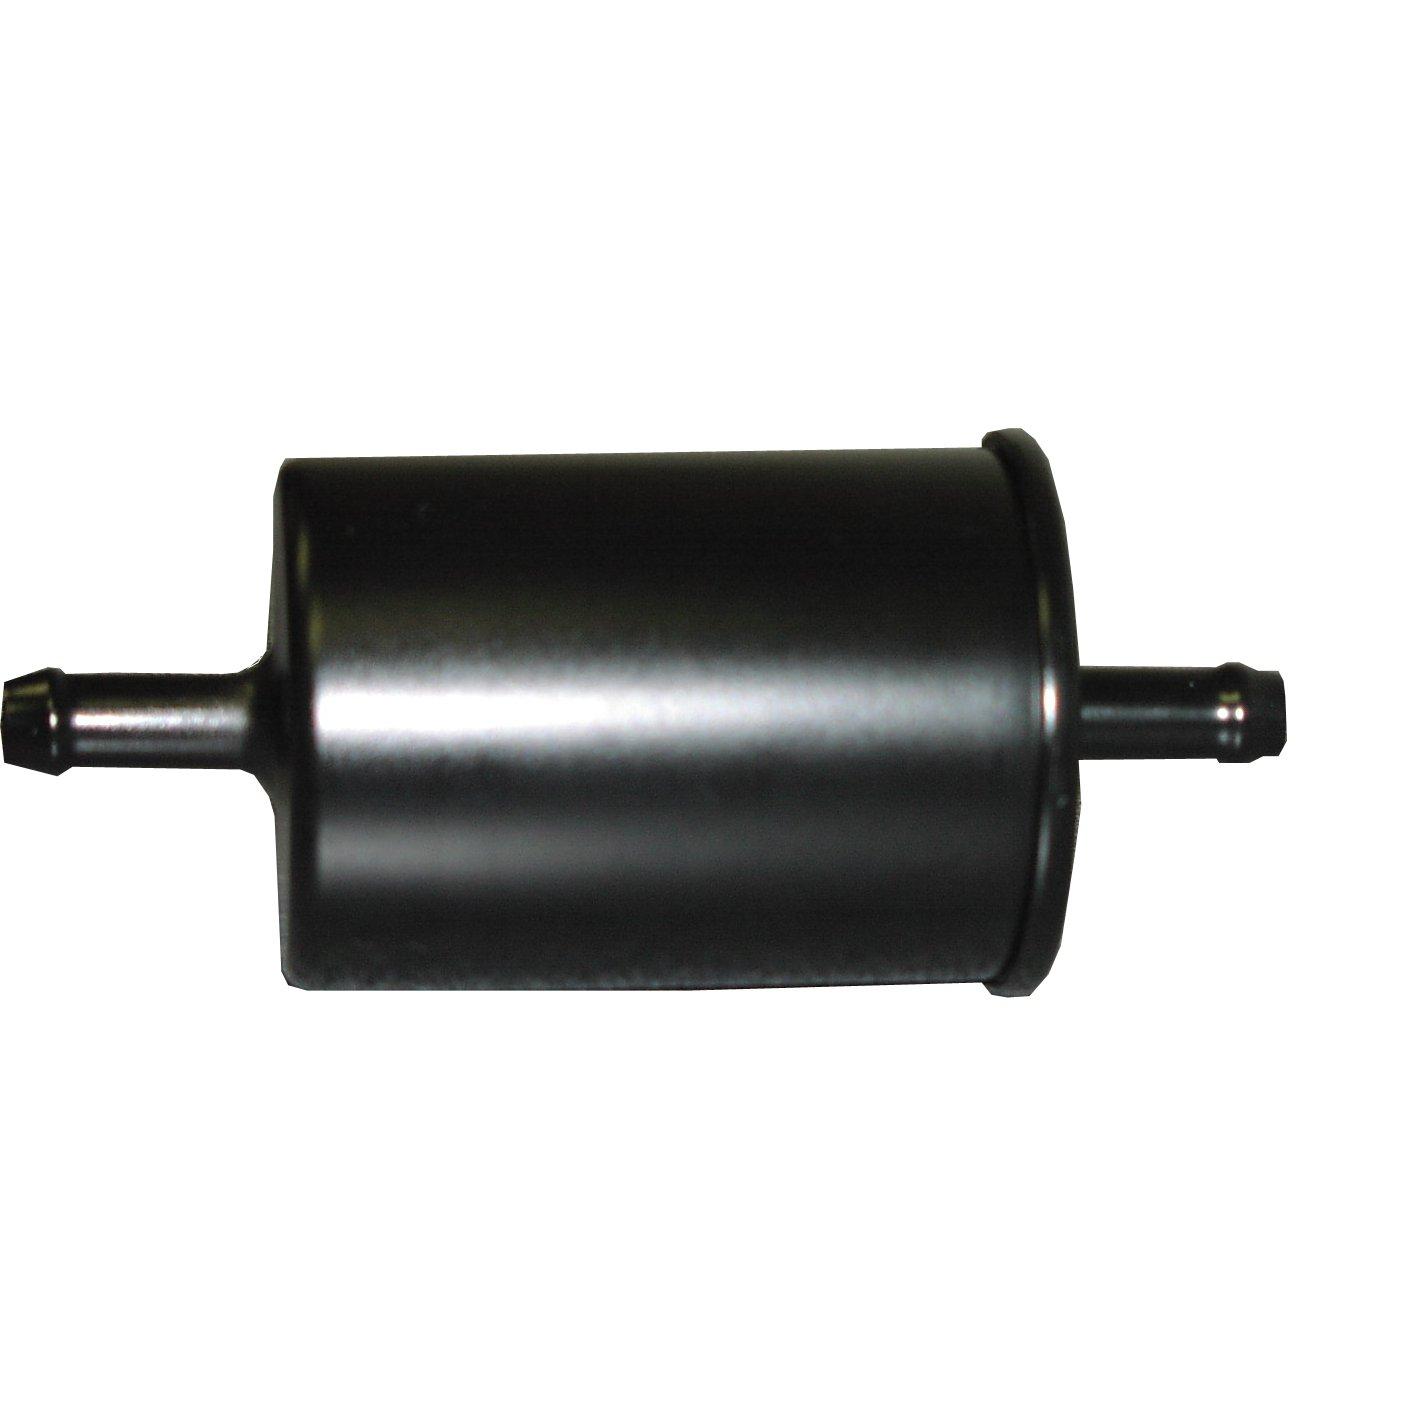 GKI PS0004 Power Steering Filter